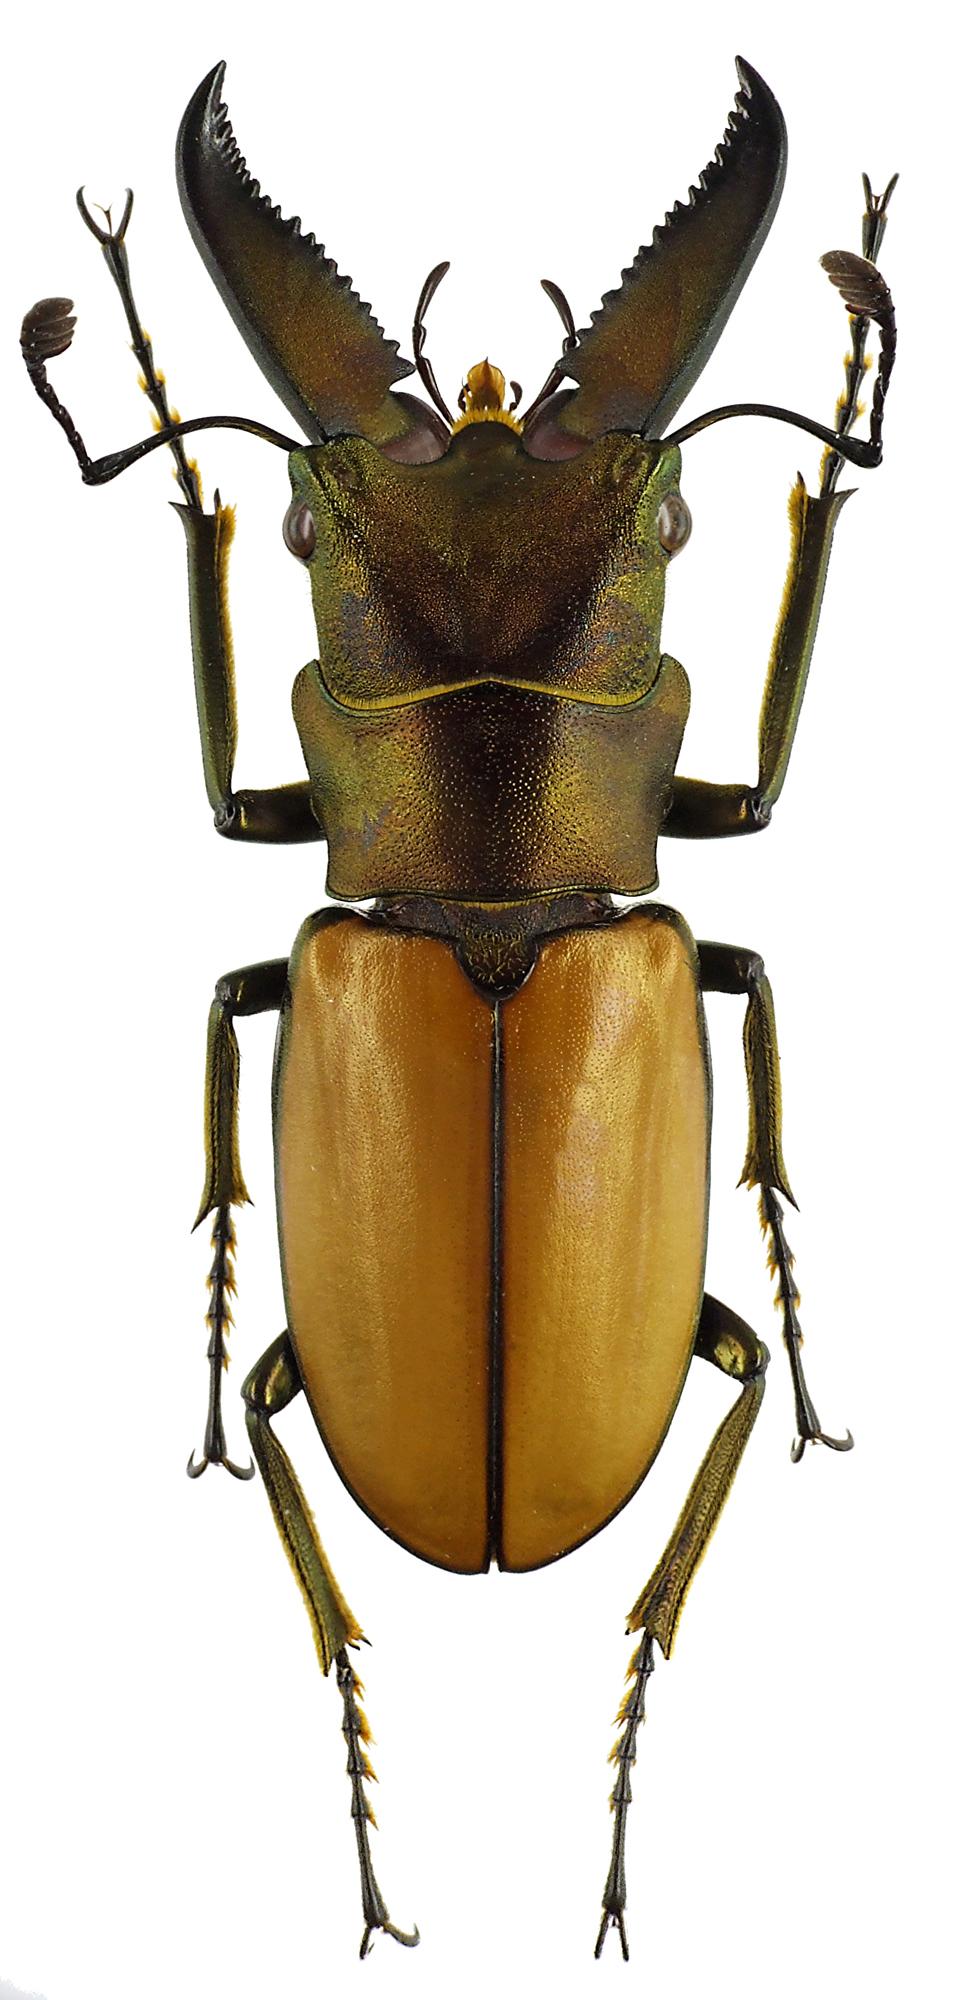 Cyclommatus magnificus 43631cz35.jpg